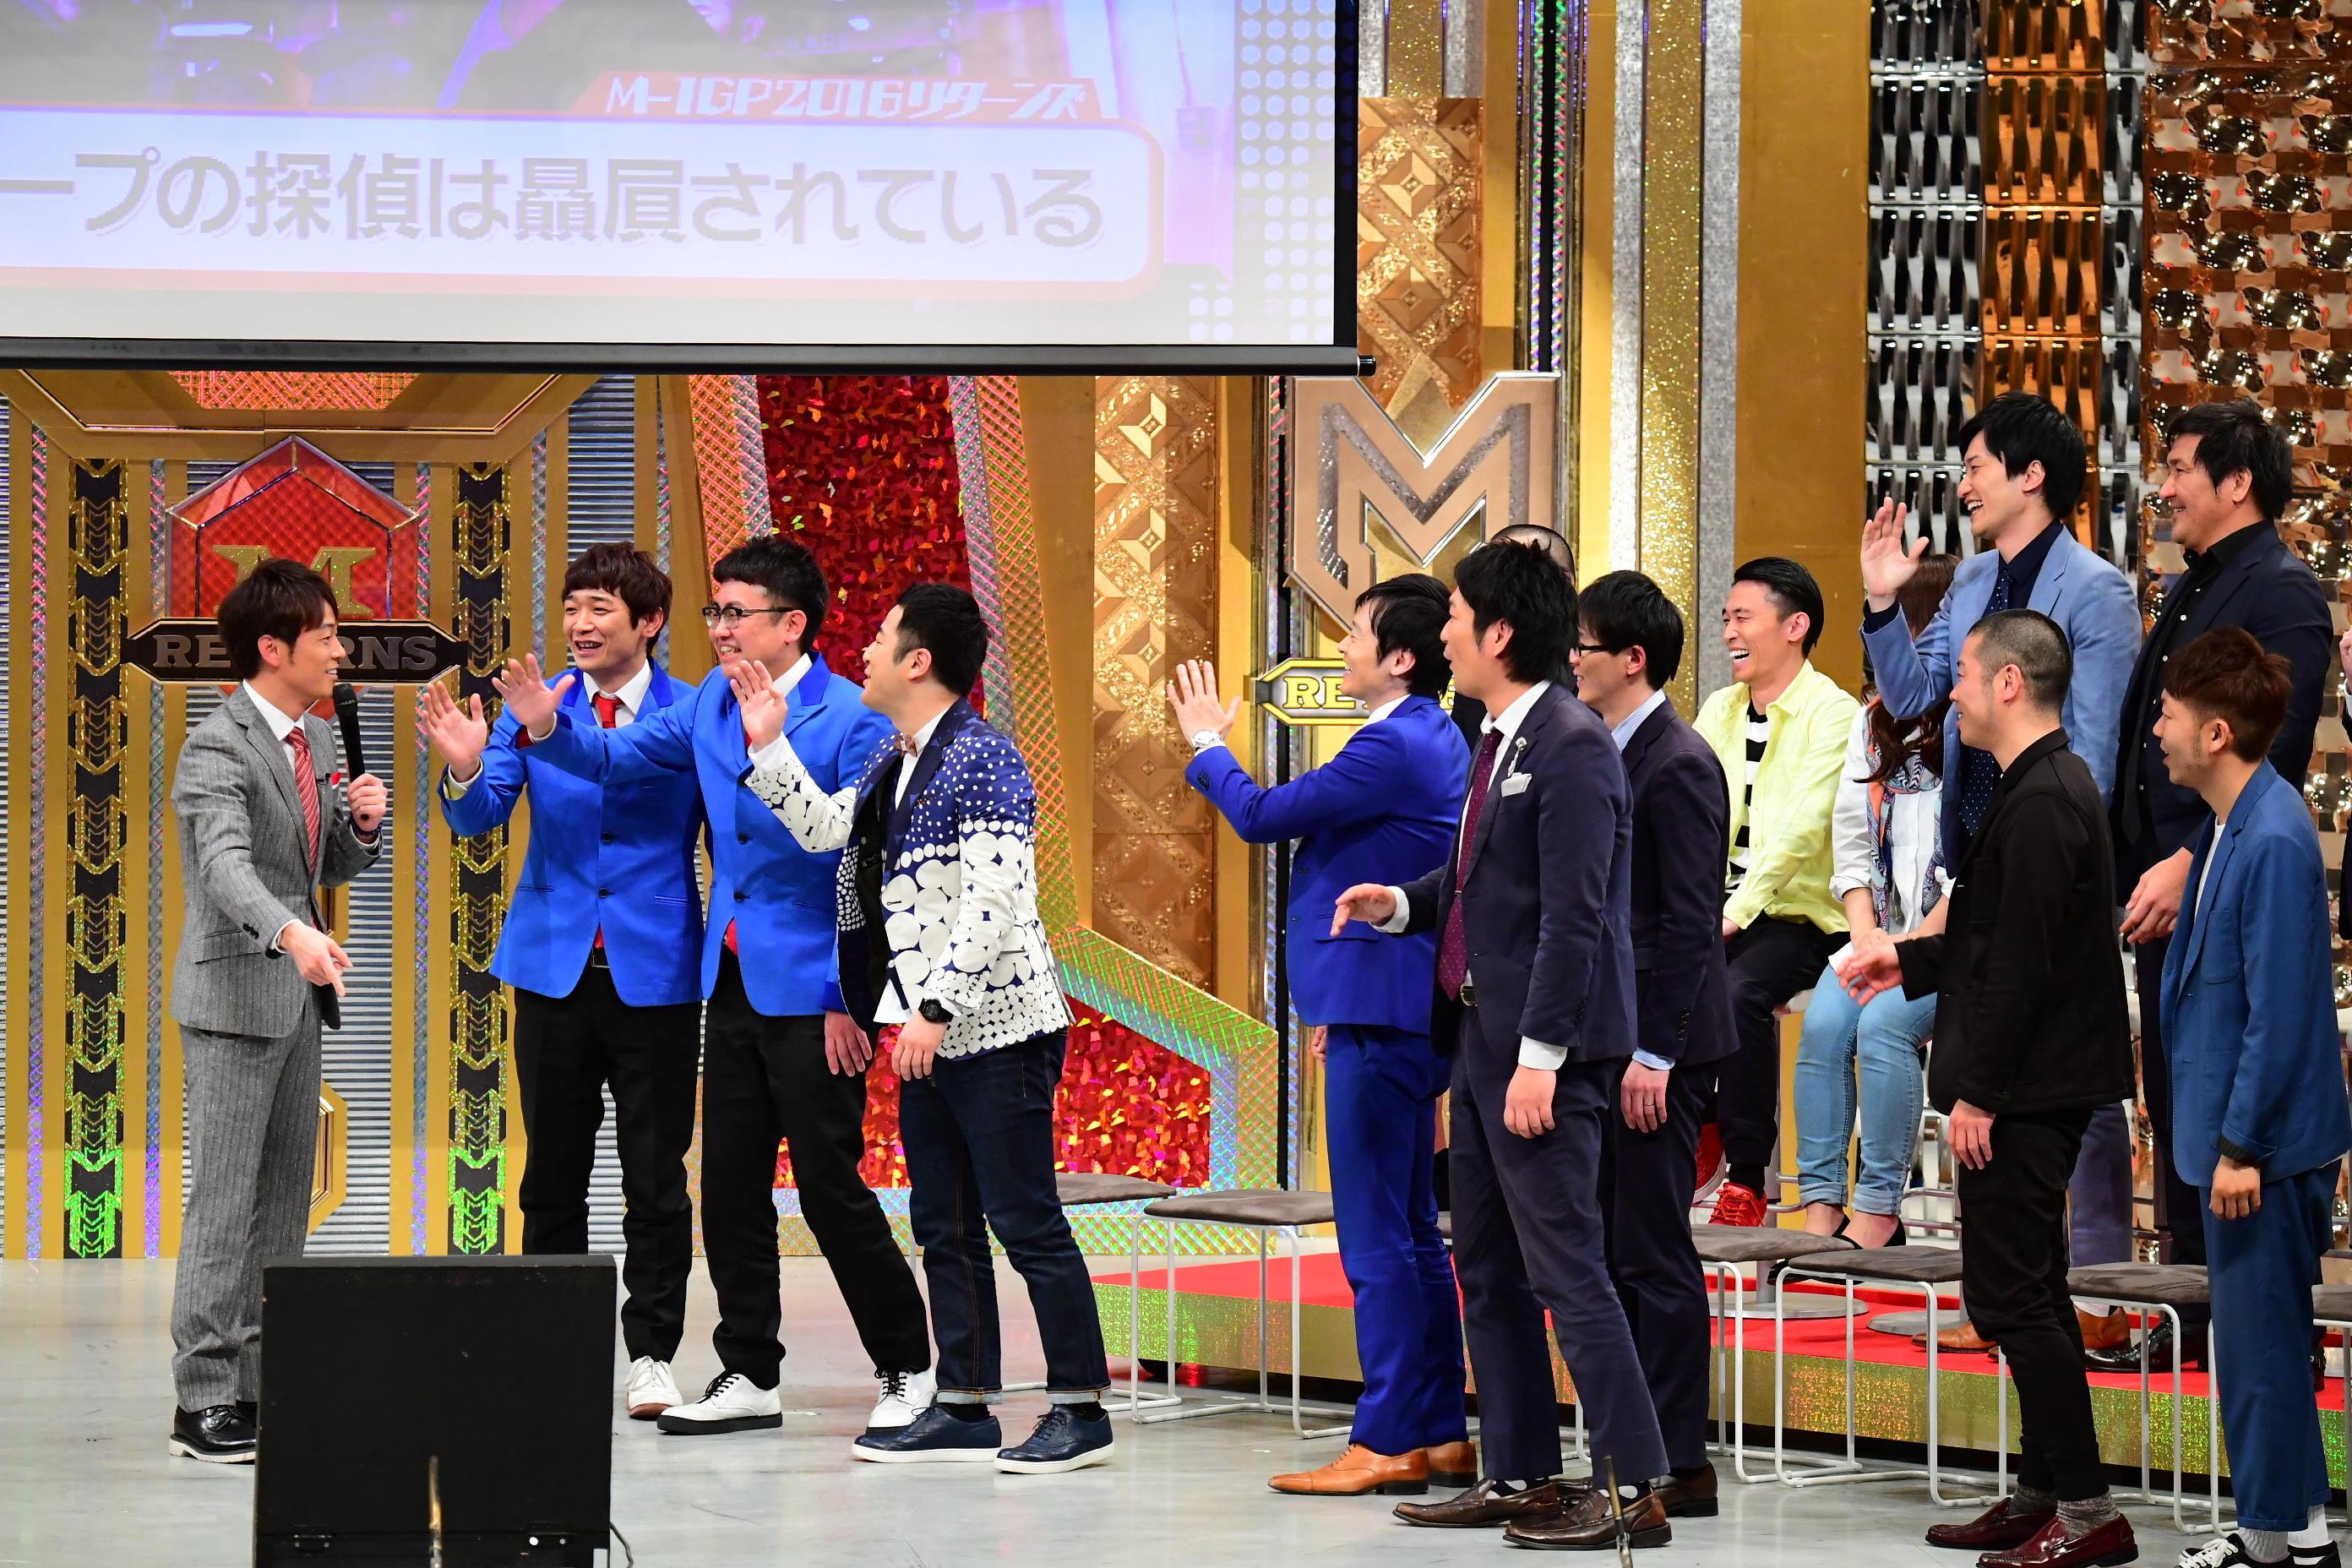 http://news.yoshimoto.co.jp/20170228155812-0e84627c7d334e6cb55f0e63ef20328ffe47c8e9.jpg